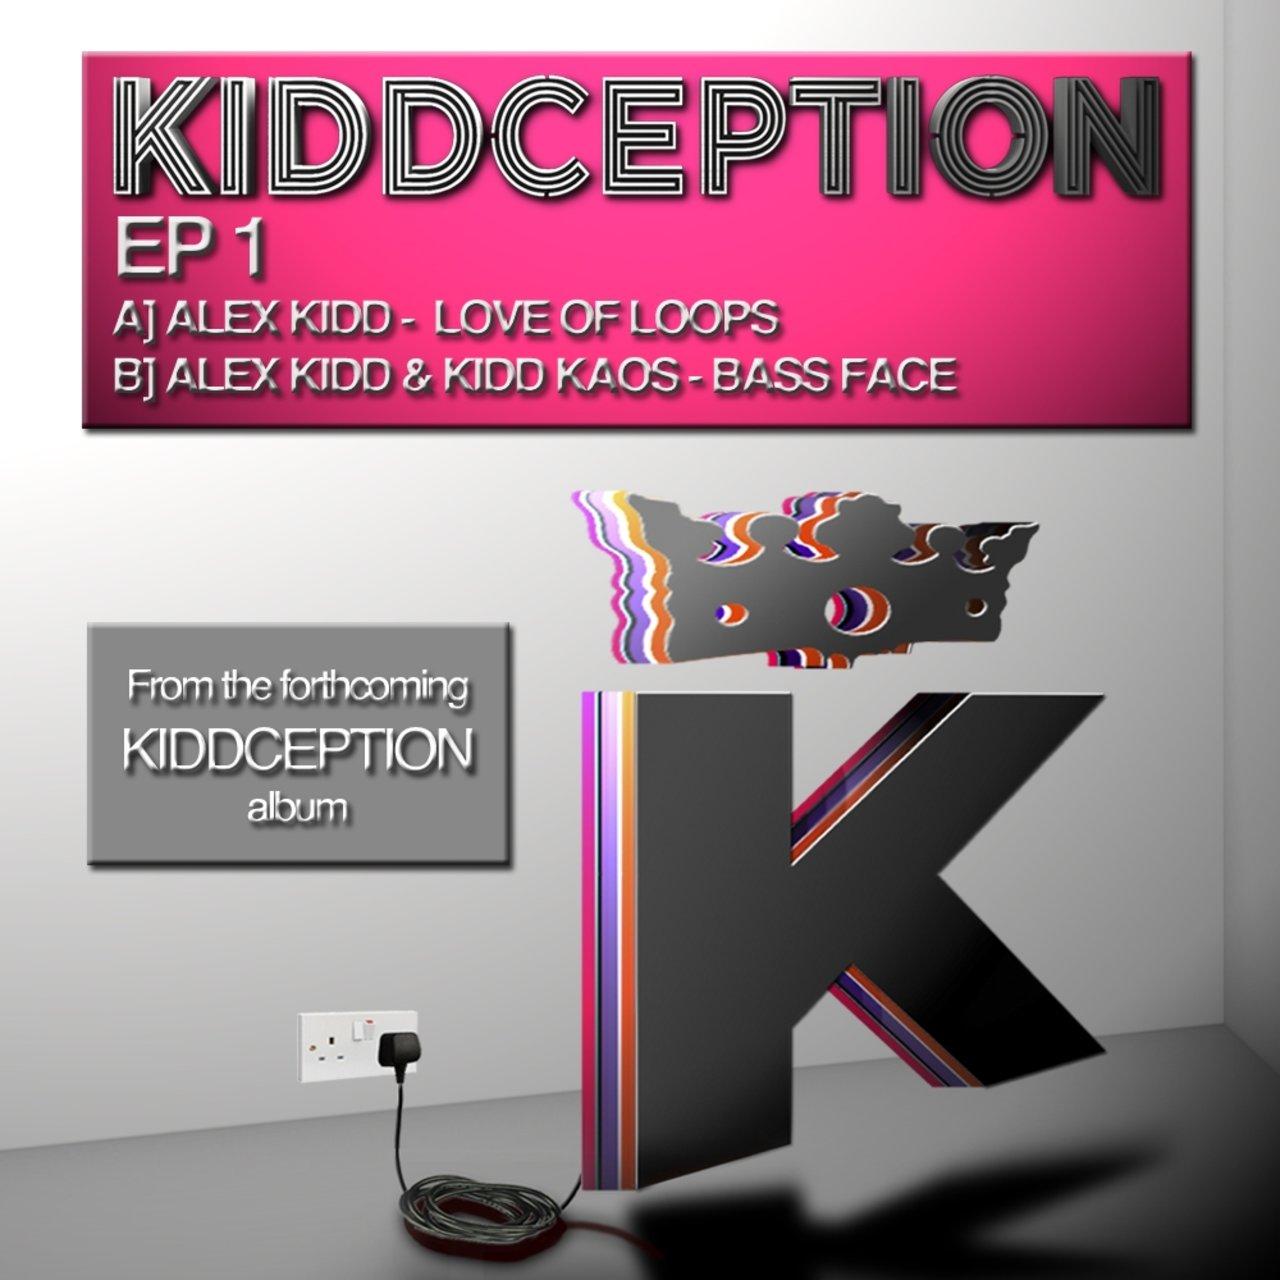 Tidal Listen To Kiddception Ep 1 On Kaos Aj